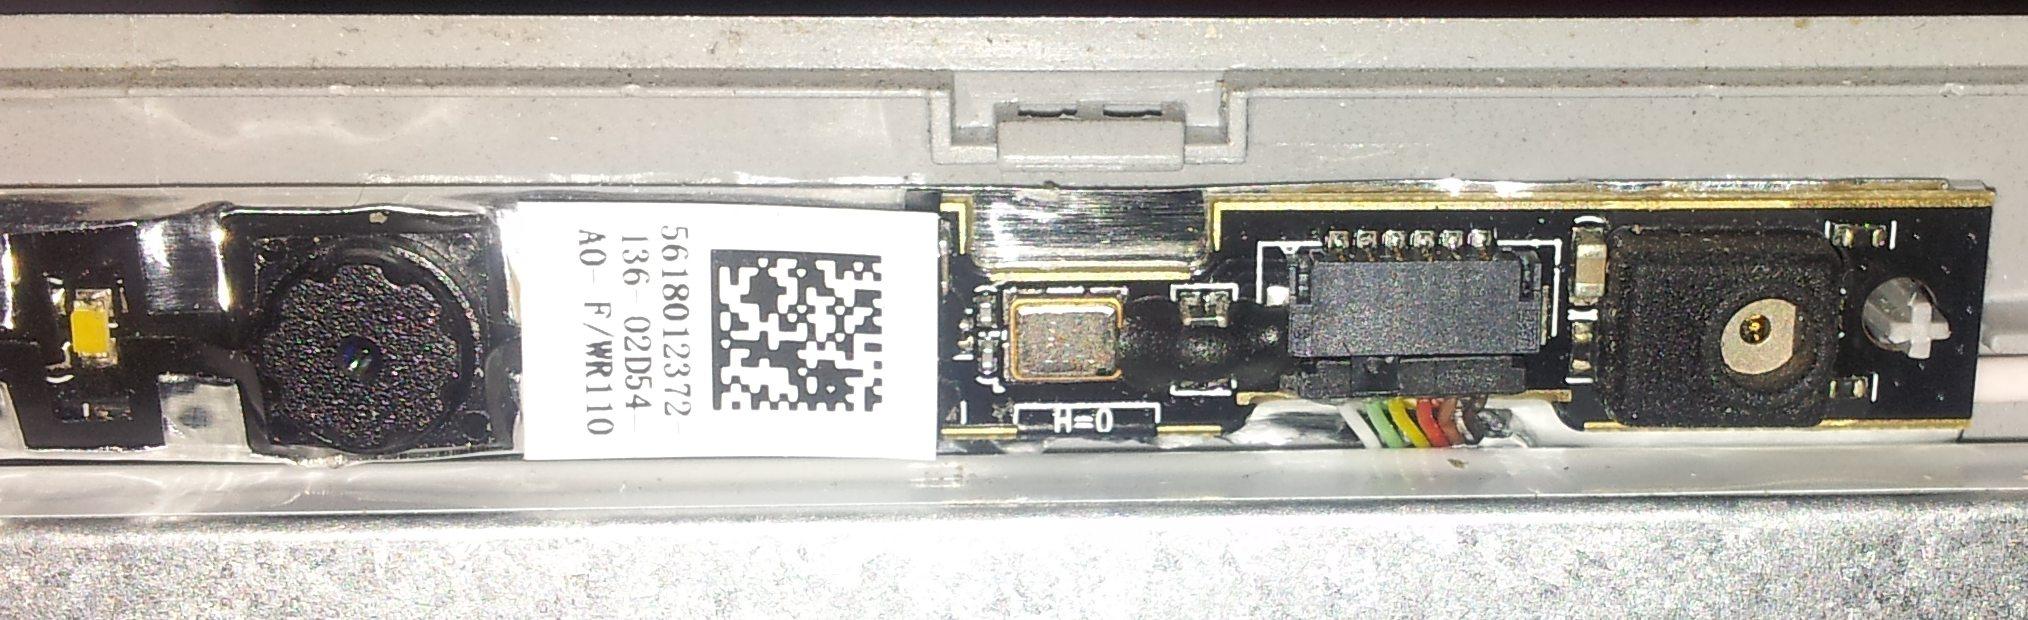 Camera_Connector_post.jpg